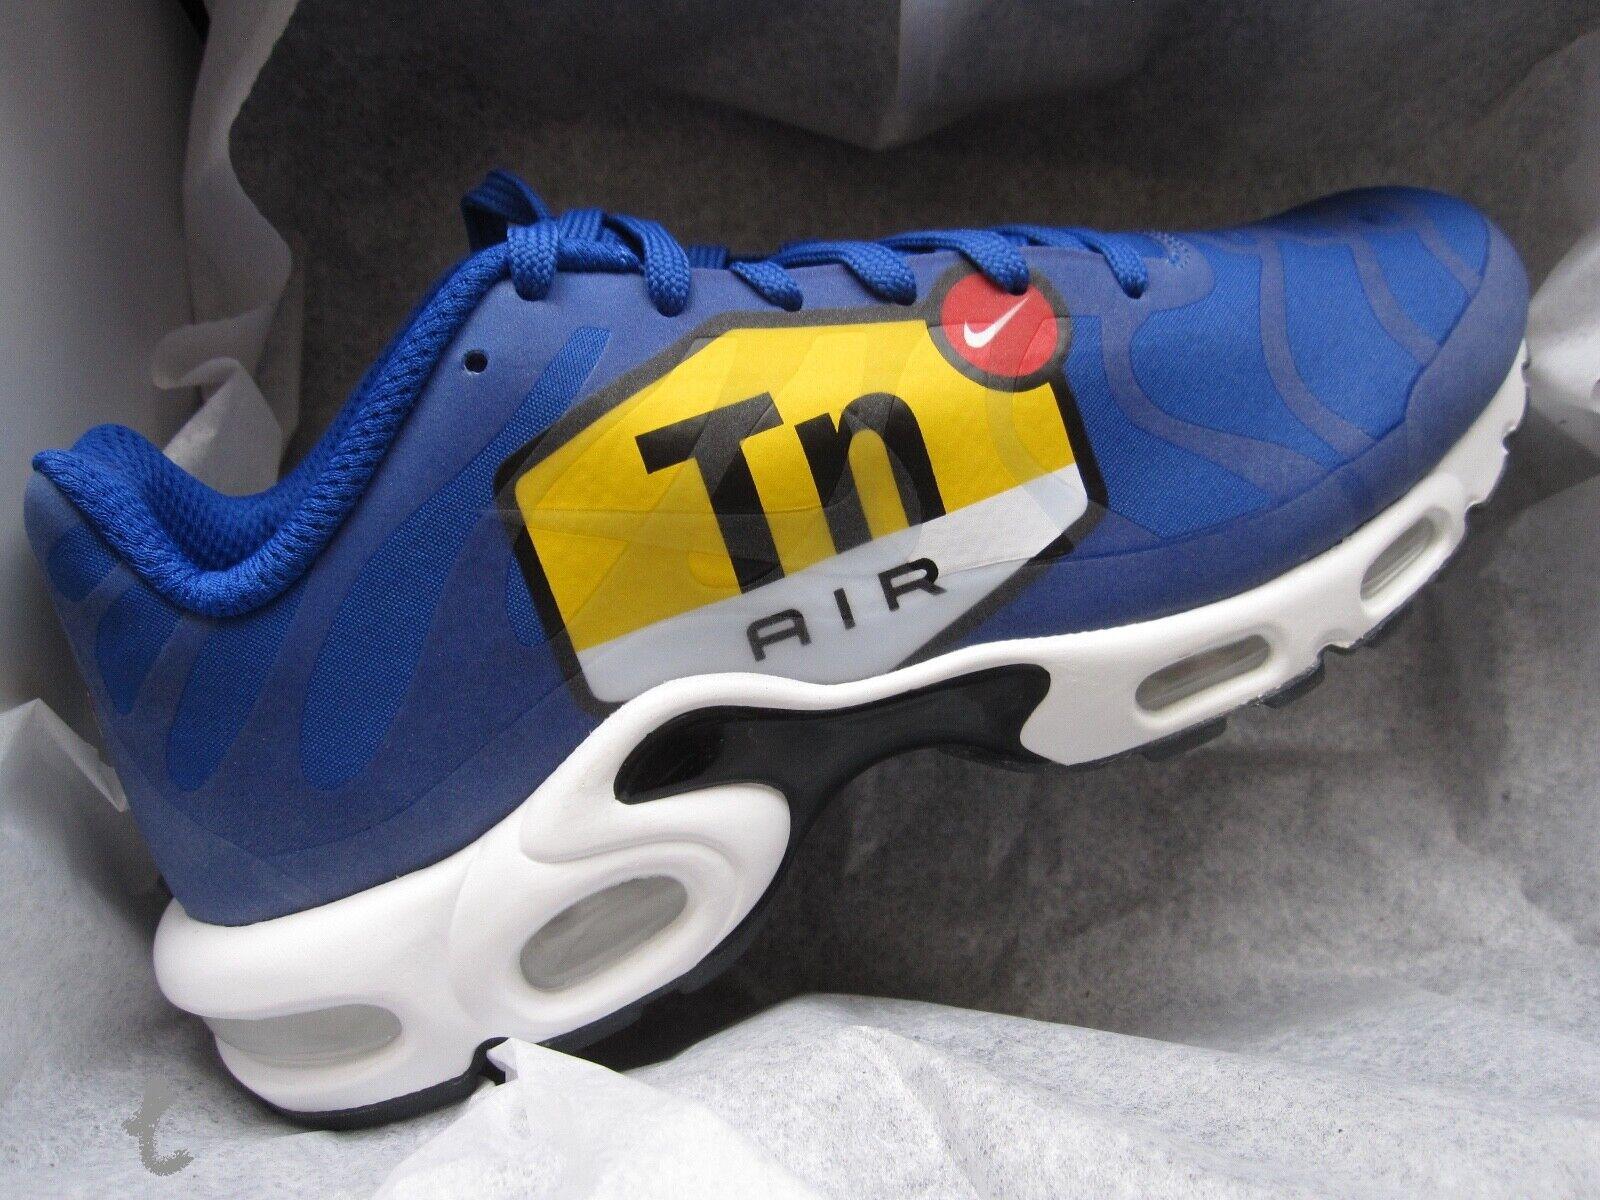 Nike Air Max Plus NS NS NS GPX (hombre ___ Talla 13 ___ últimos 1, AJ7181 400, logotipo sintonizado 8fcb71